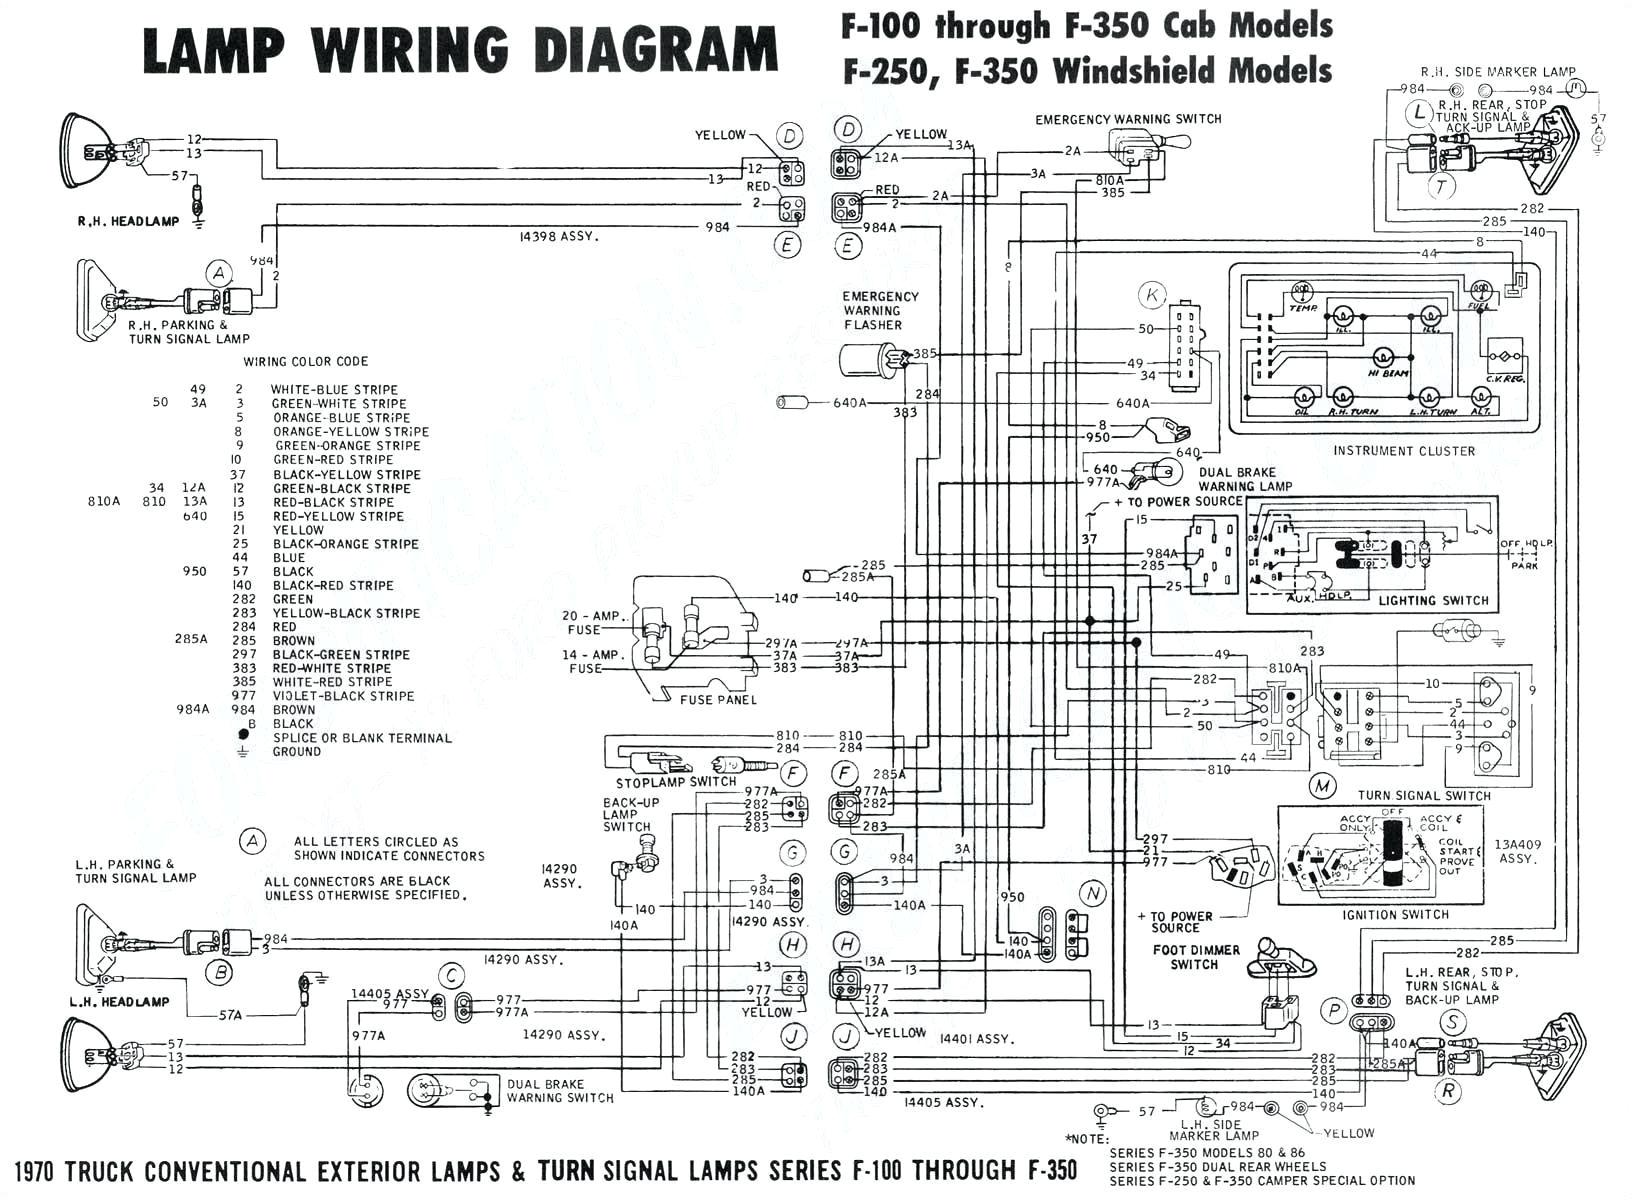 93 Honda Civic Wiring Harness Diagram 1993 Honda Accord Wiring Harness Diagram Furthermore 2001 Honda